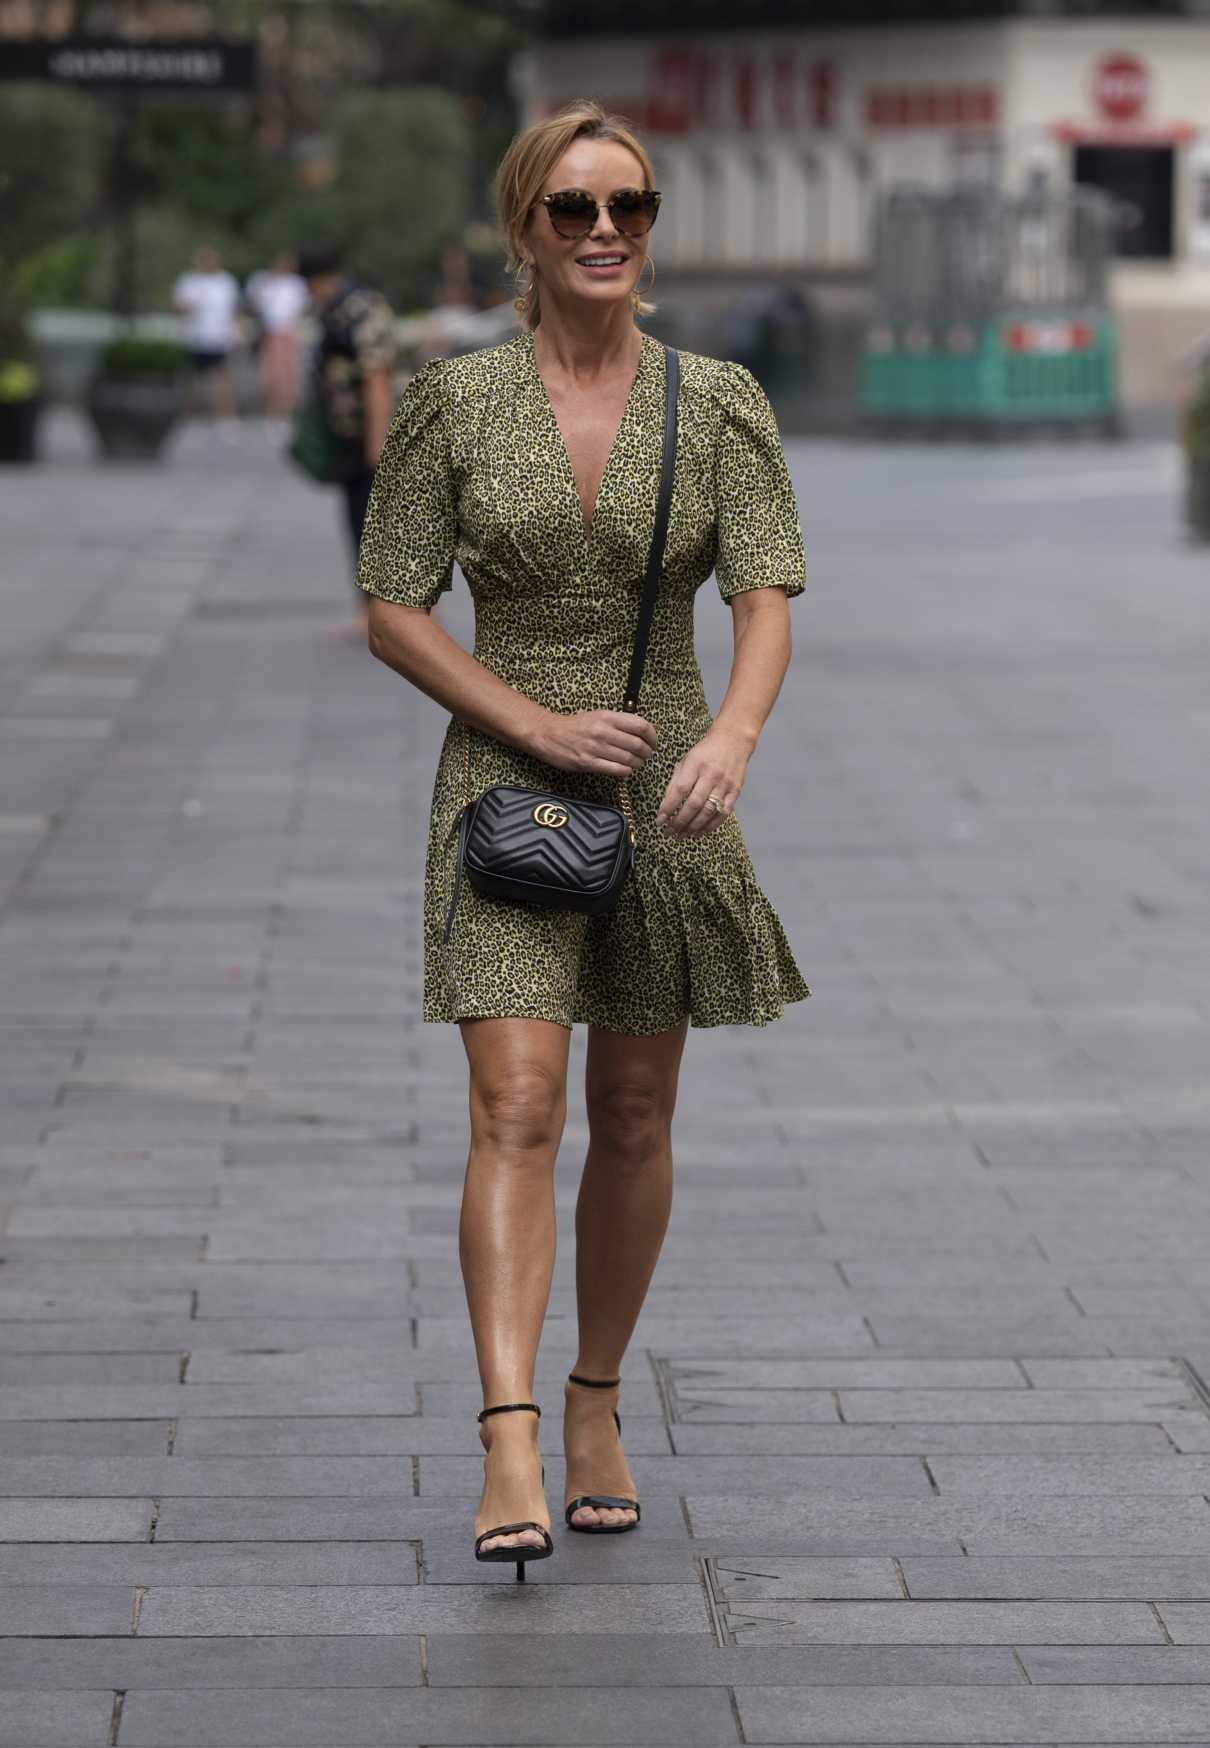 Amanda Holden in an Olive Animal Print Dress